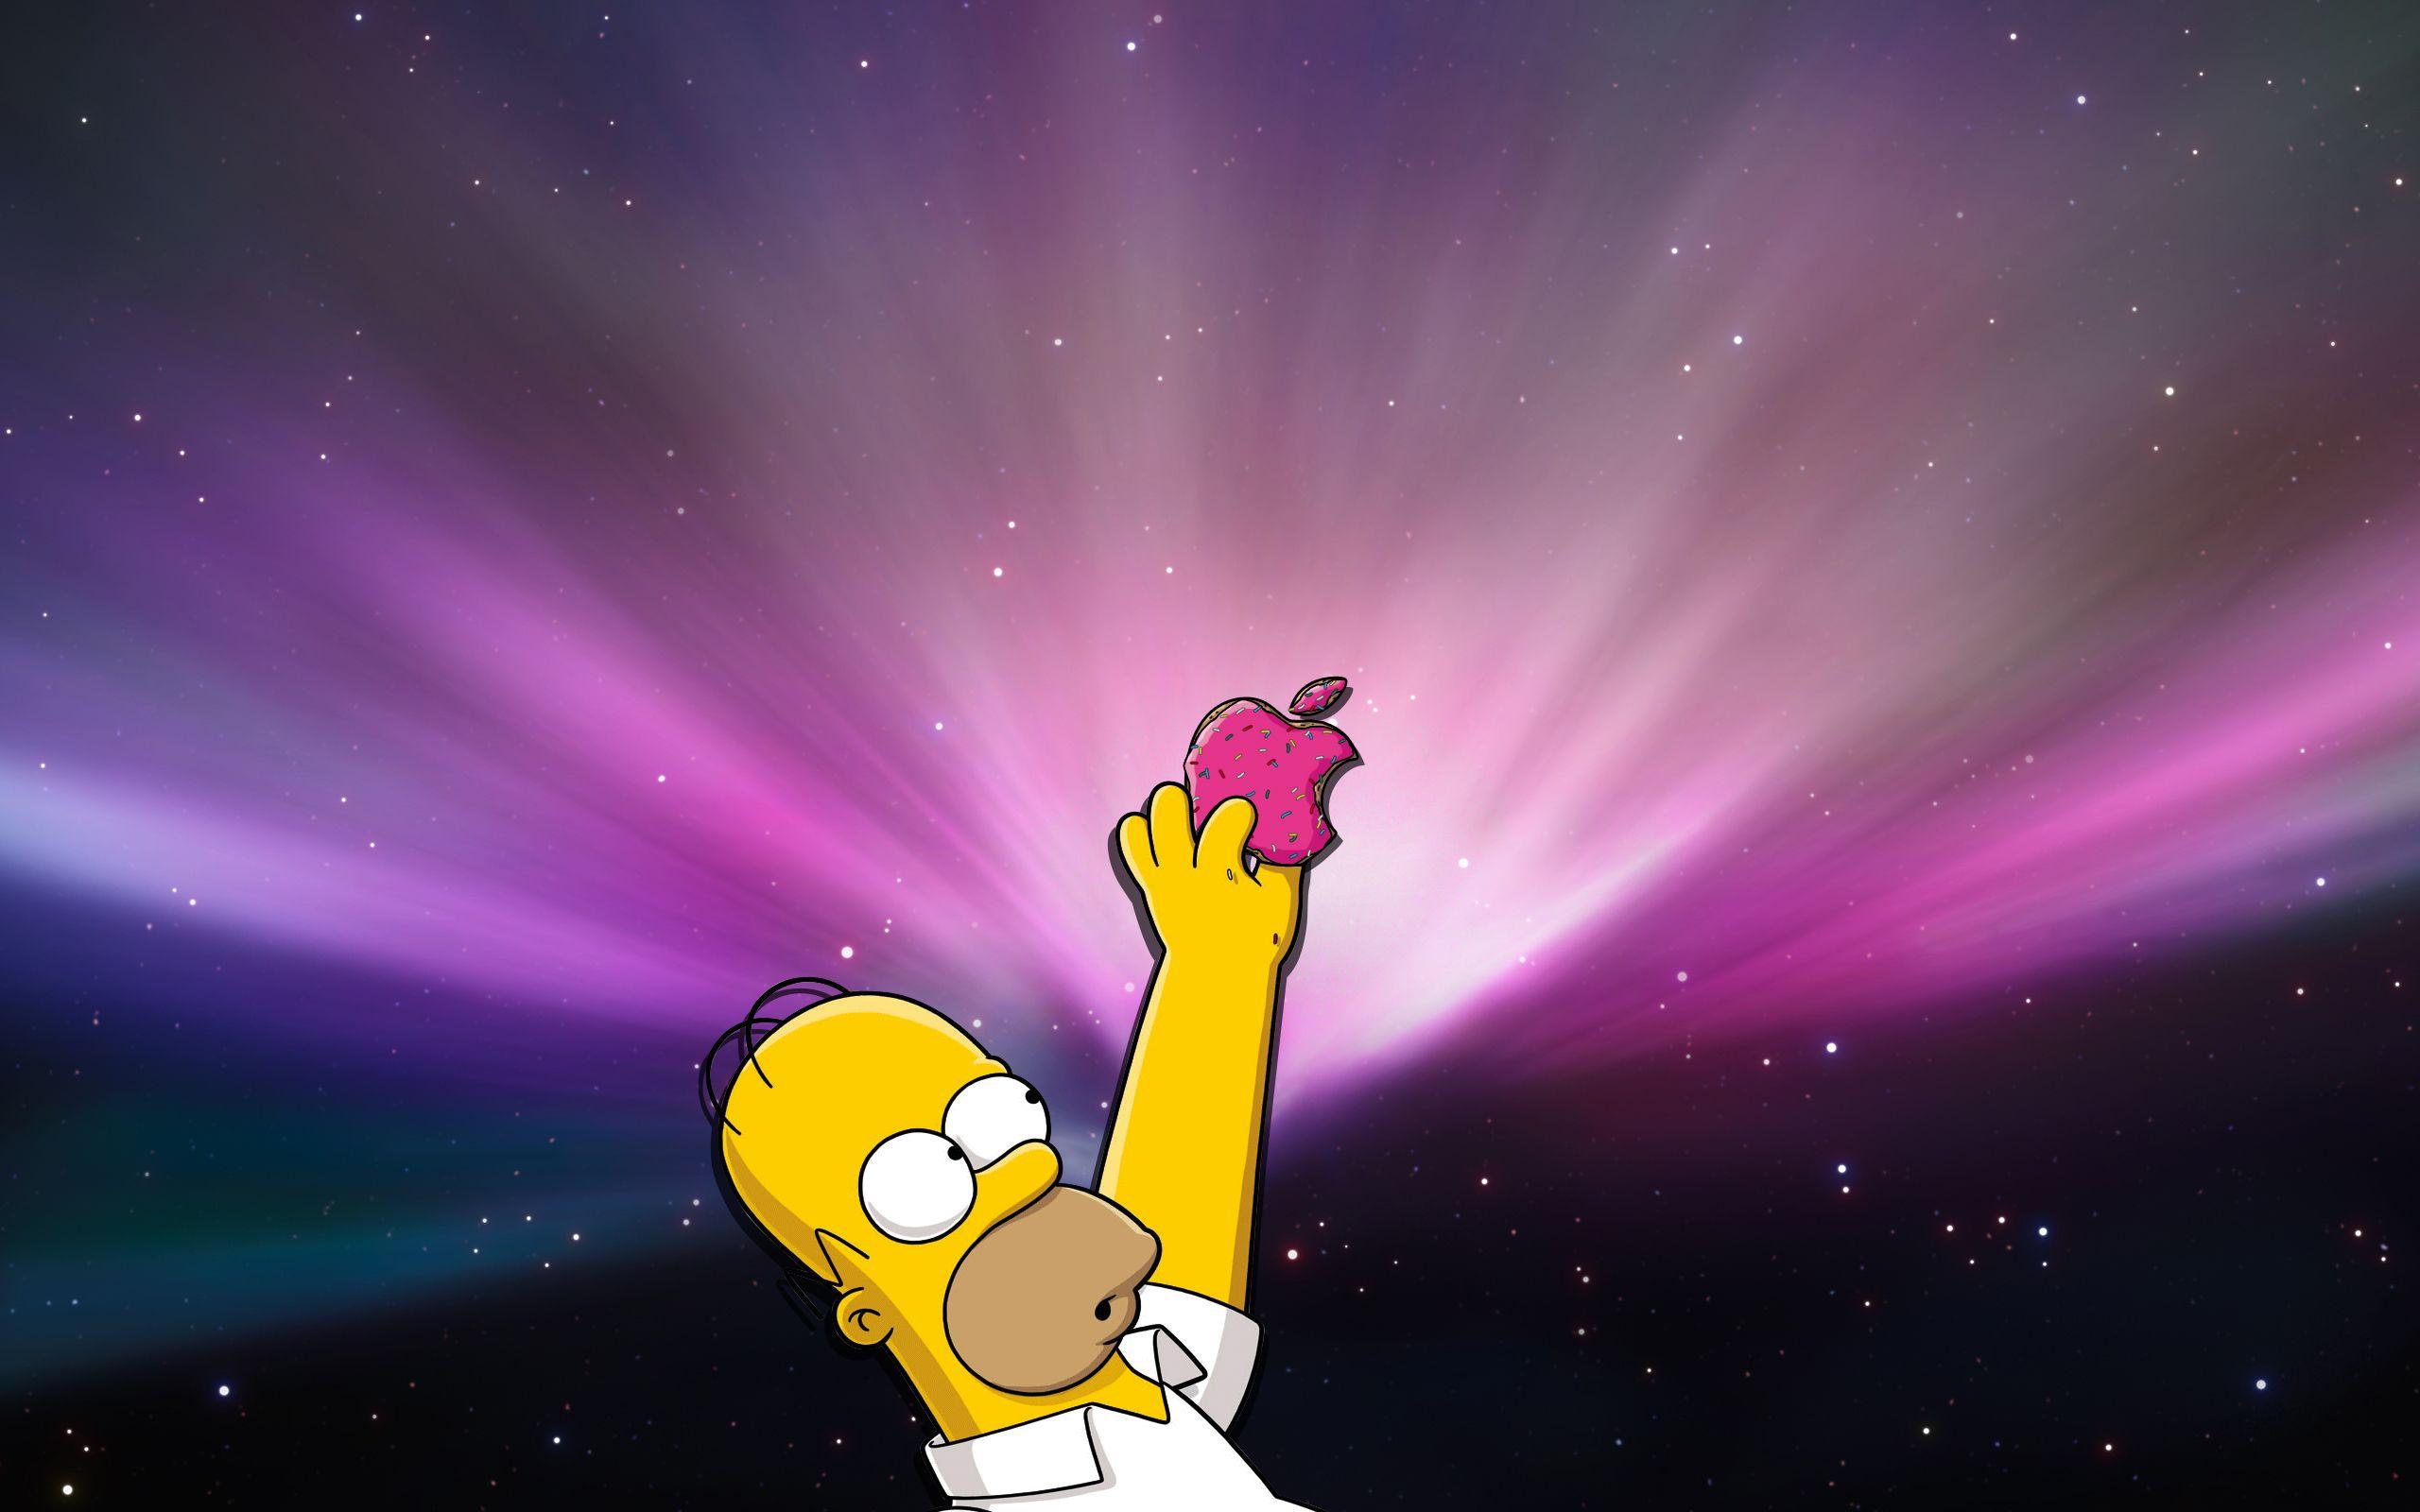 Simpsons Wallpaper For Bedroom Homer Apple Simpsons Wallpaper Hd Http Imashoncom W Homer